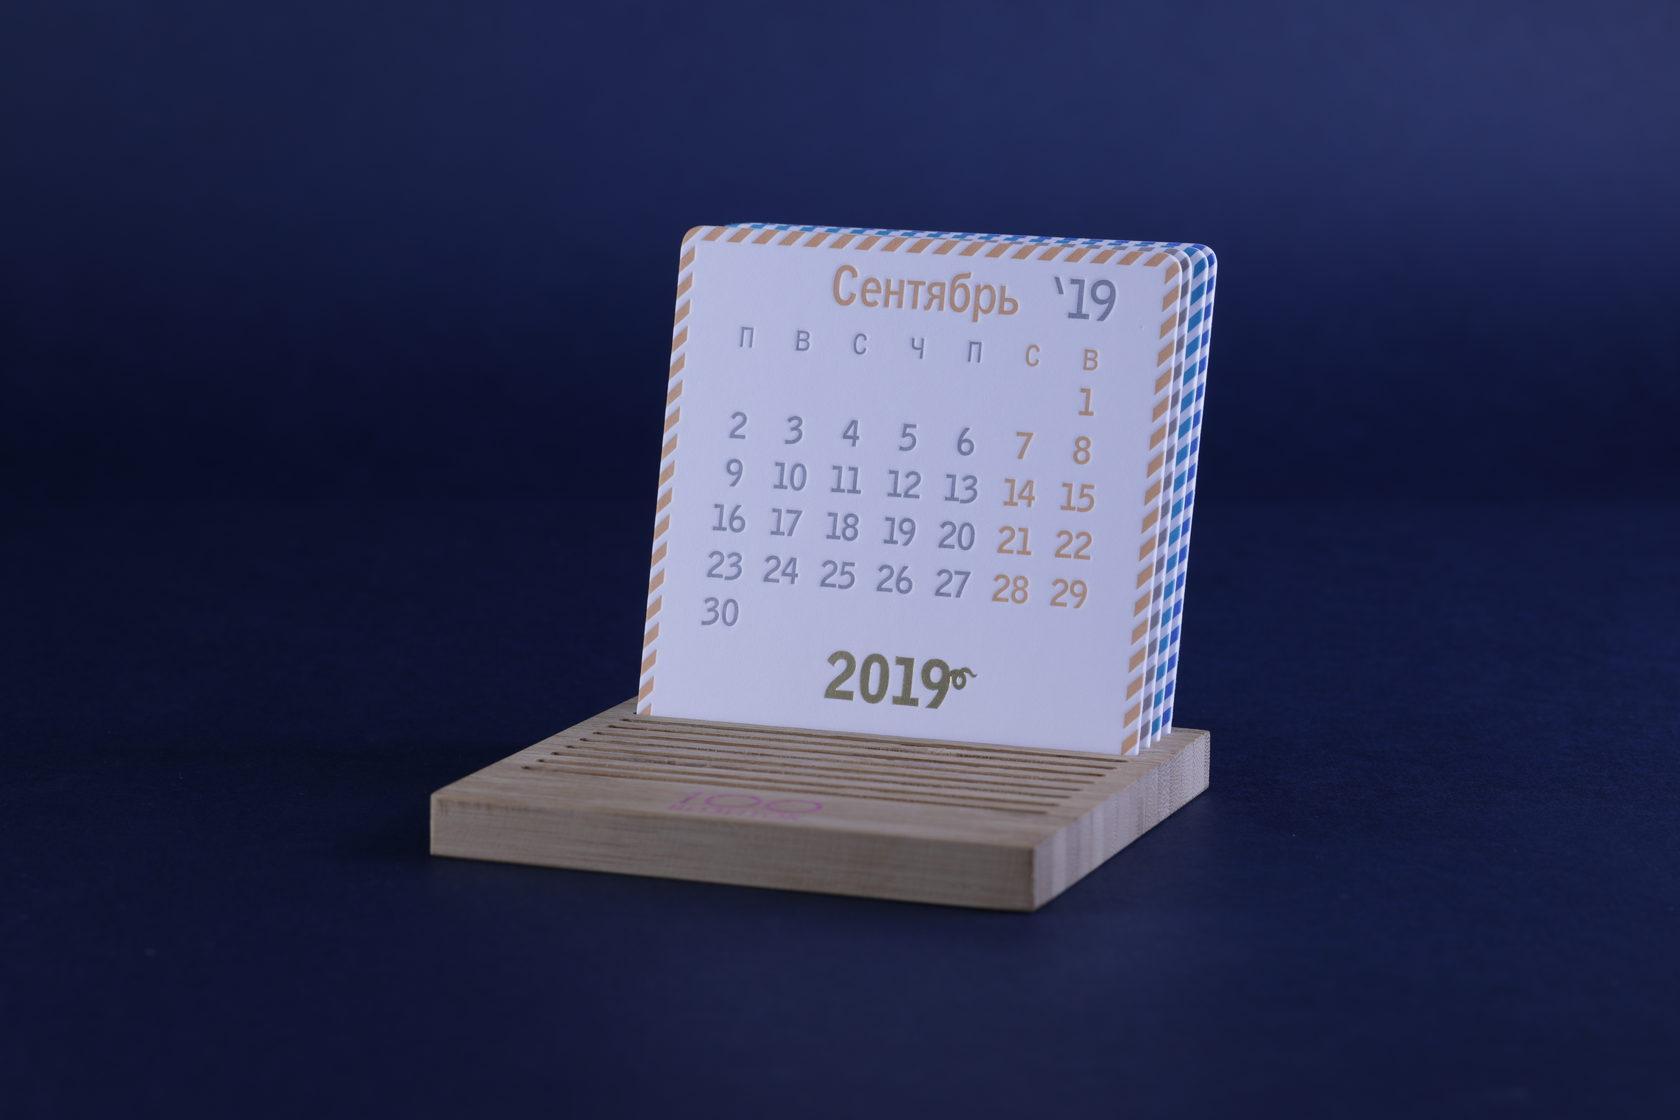 Бамбуковая подставка для календаря